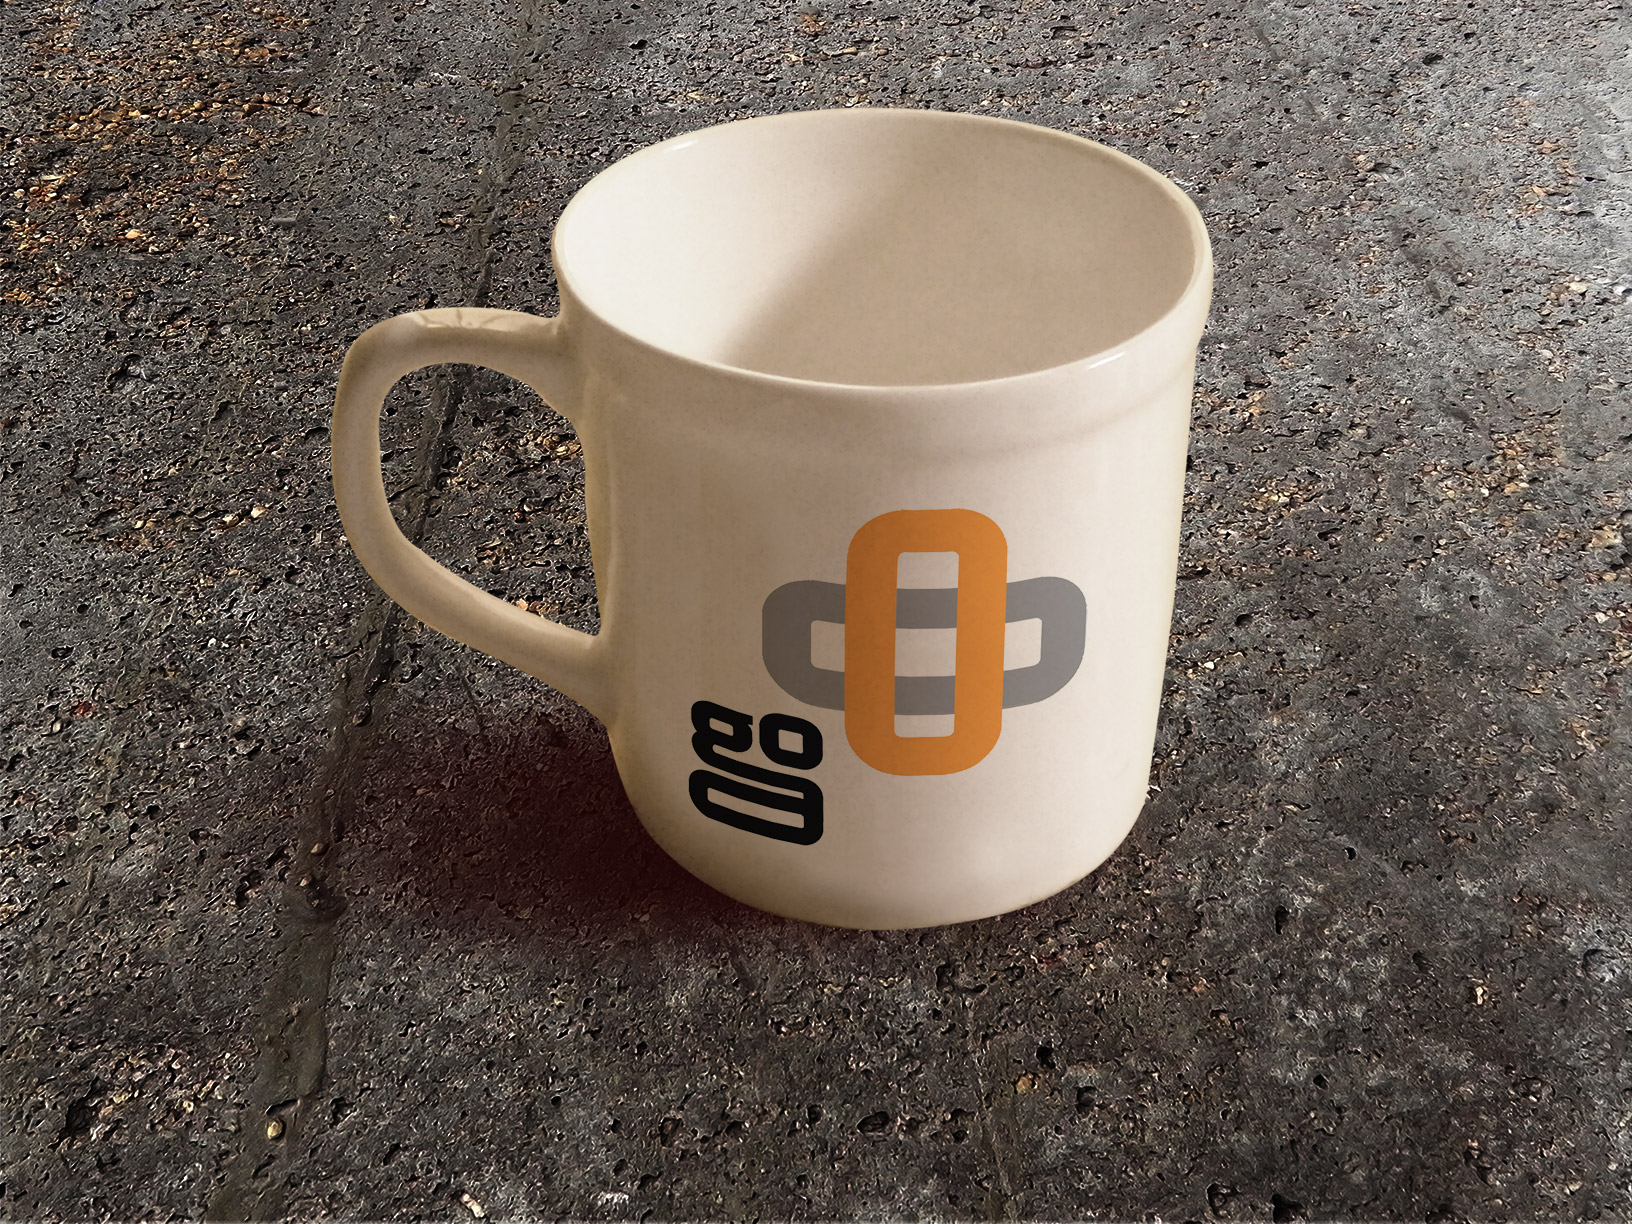 wood-be-good-mug